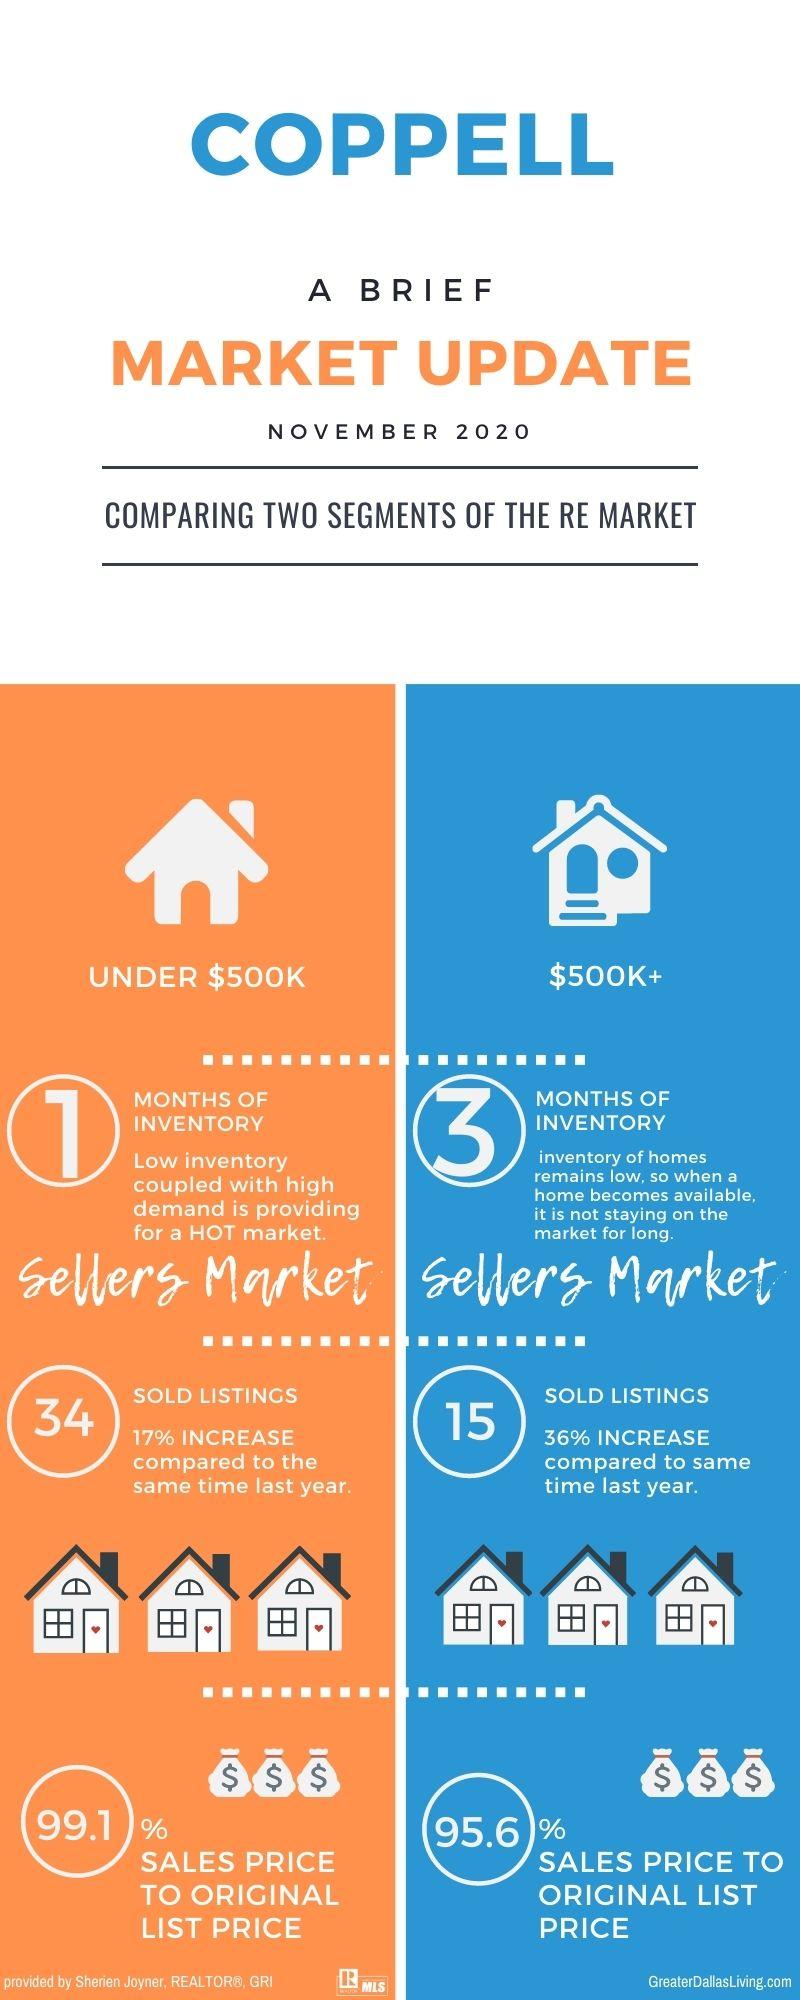 November Market Update for Coppell Texas